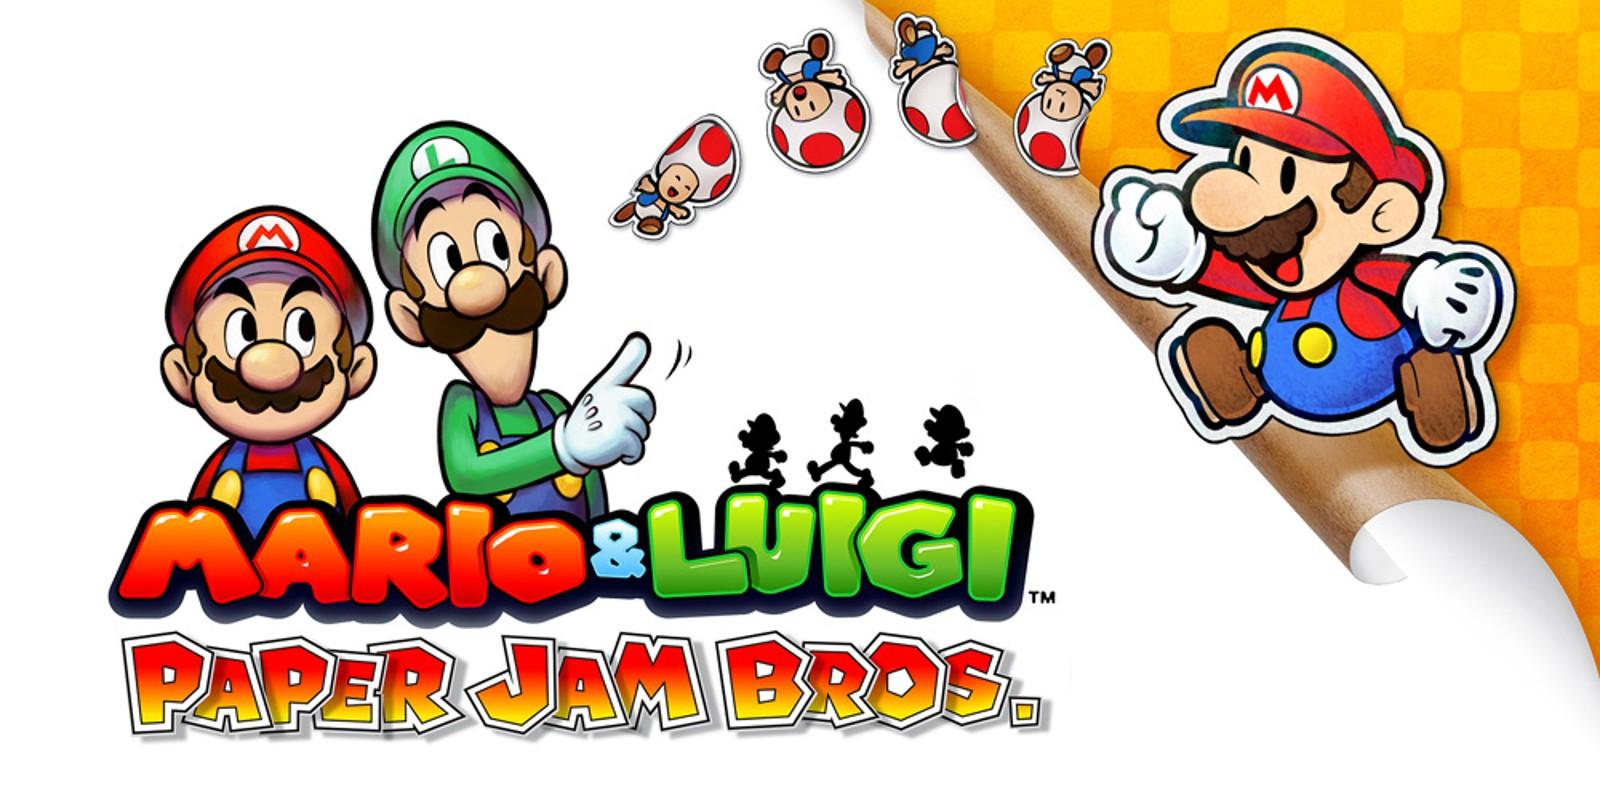 Mario Luigi Paper Jam Bros Nintendo 3ds Games Nintendo